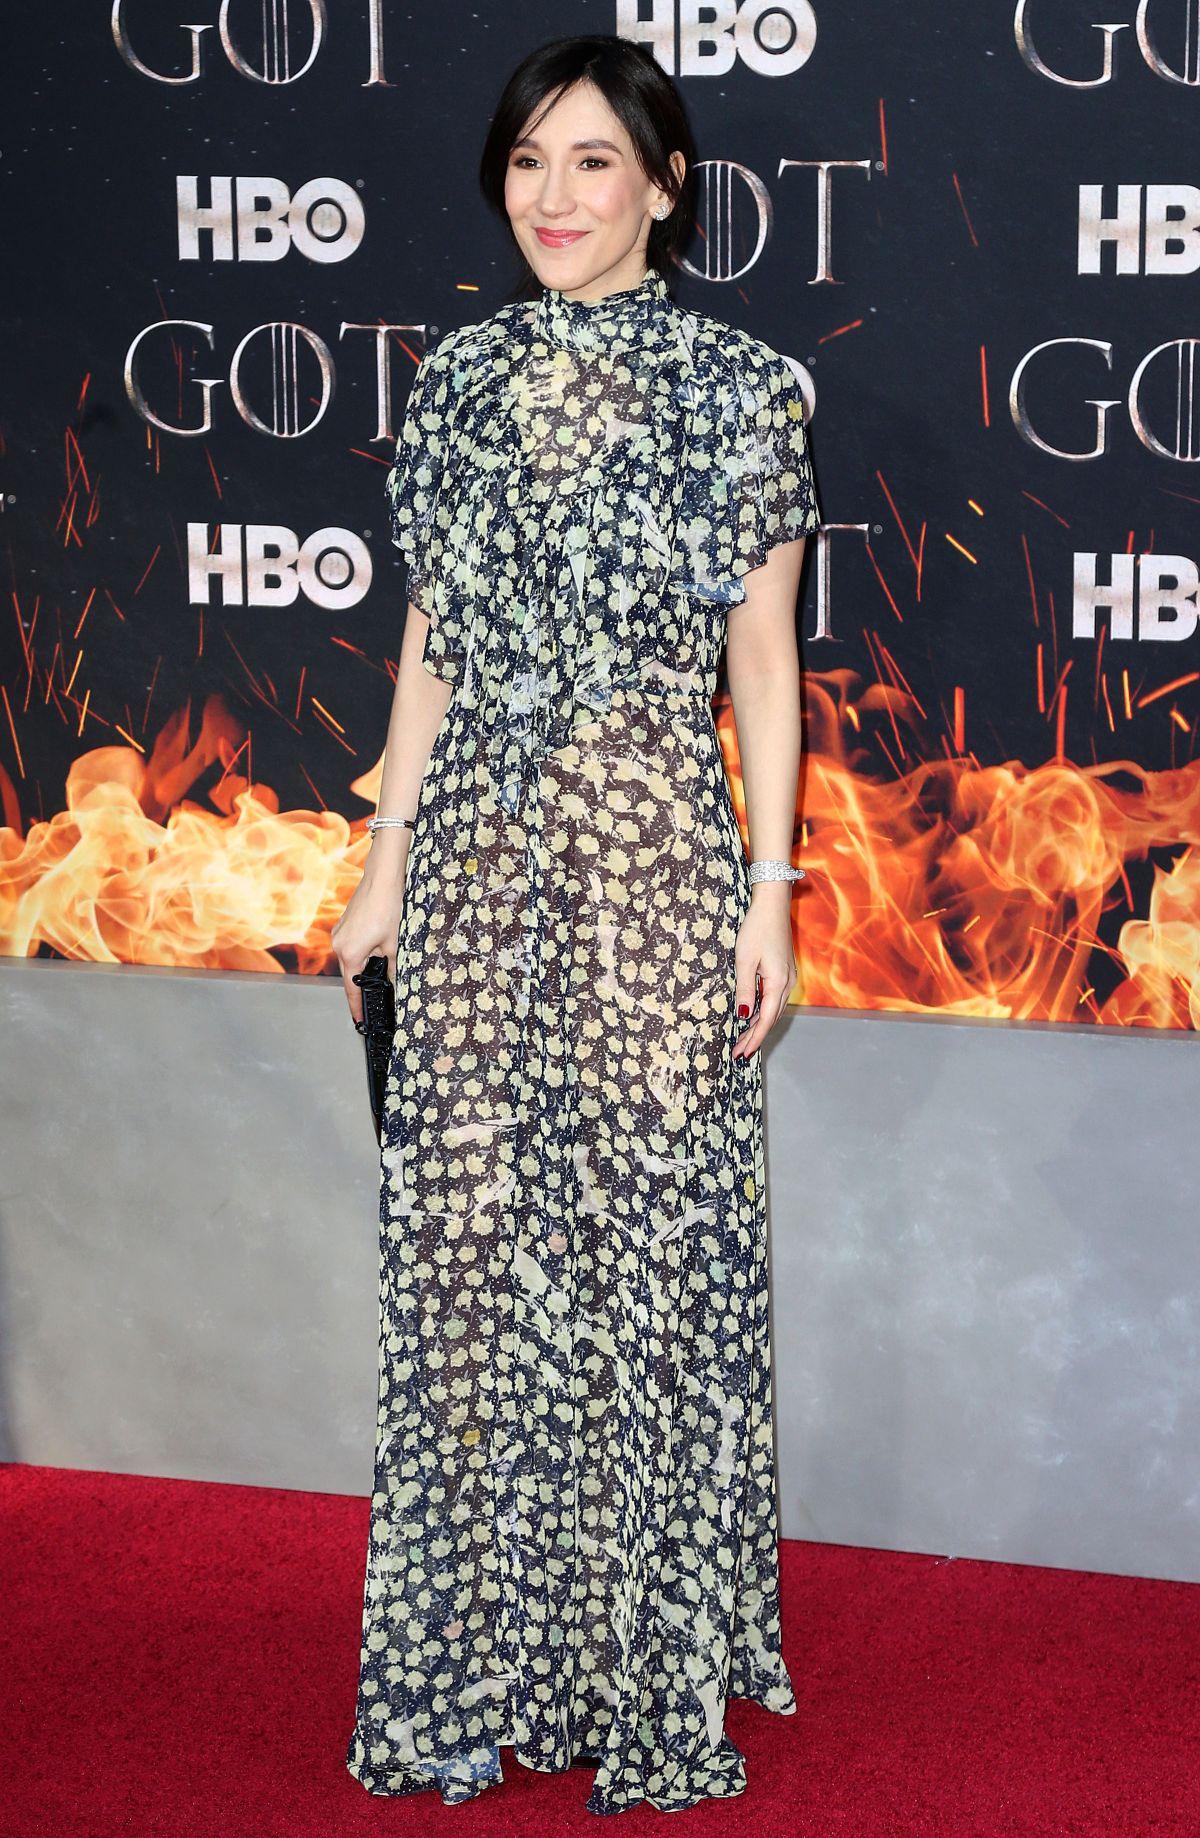 Sibel Kekilli Game Of Thrones Rolle